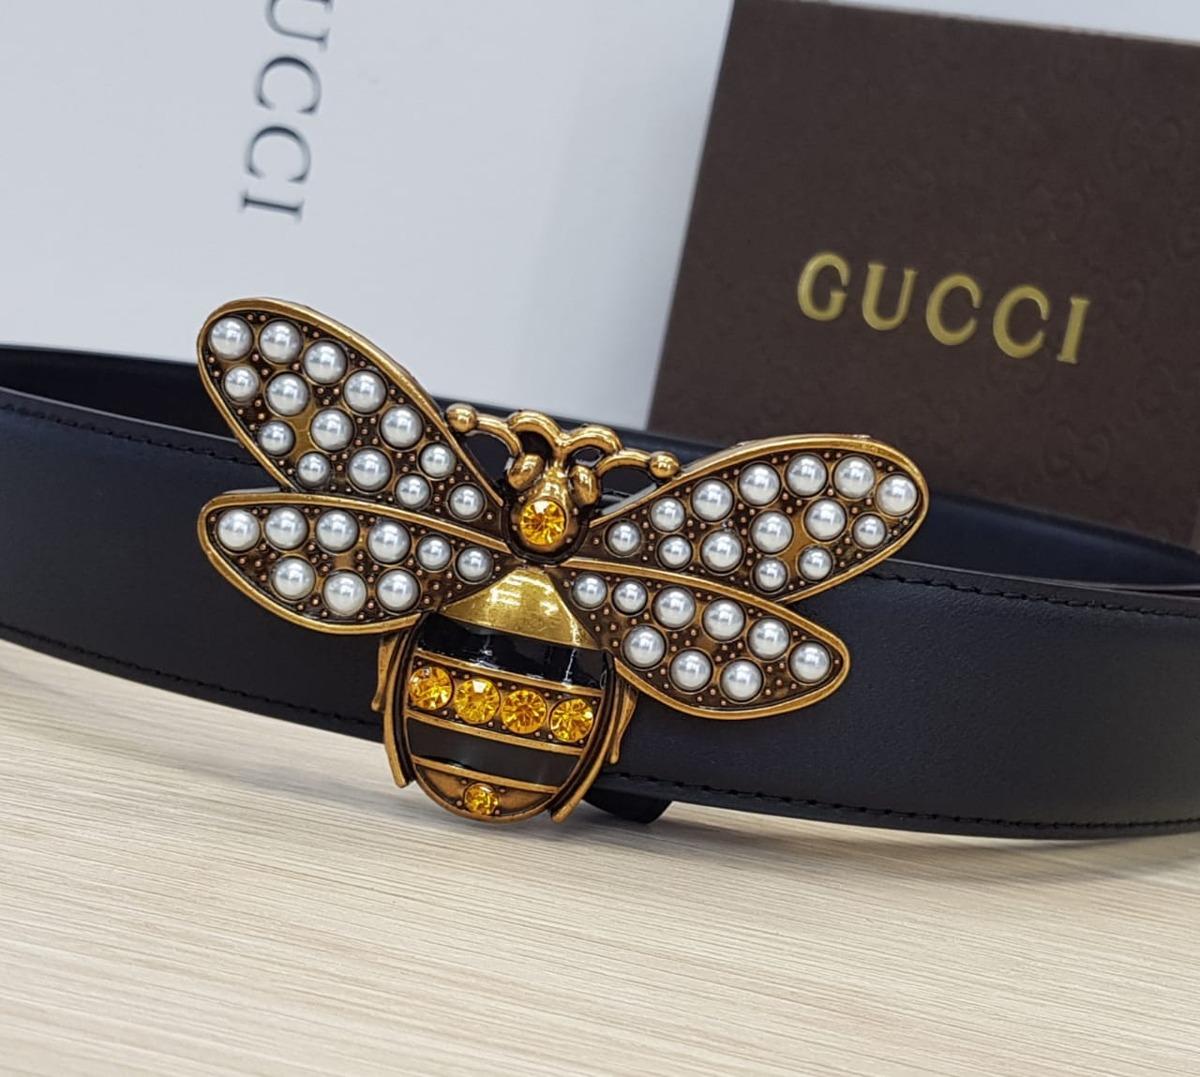 Cinturon Gucci Mujer -   130.000 en Mercado Libre eb2c21a8cc9